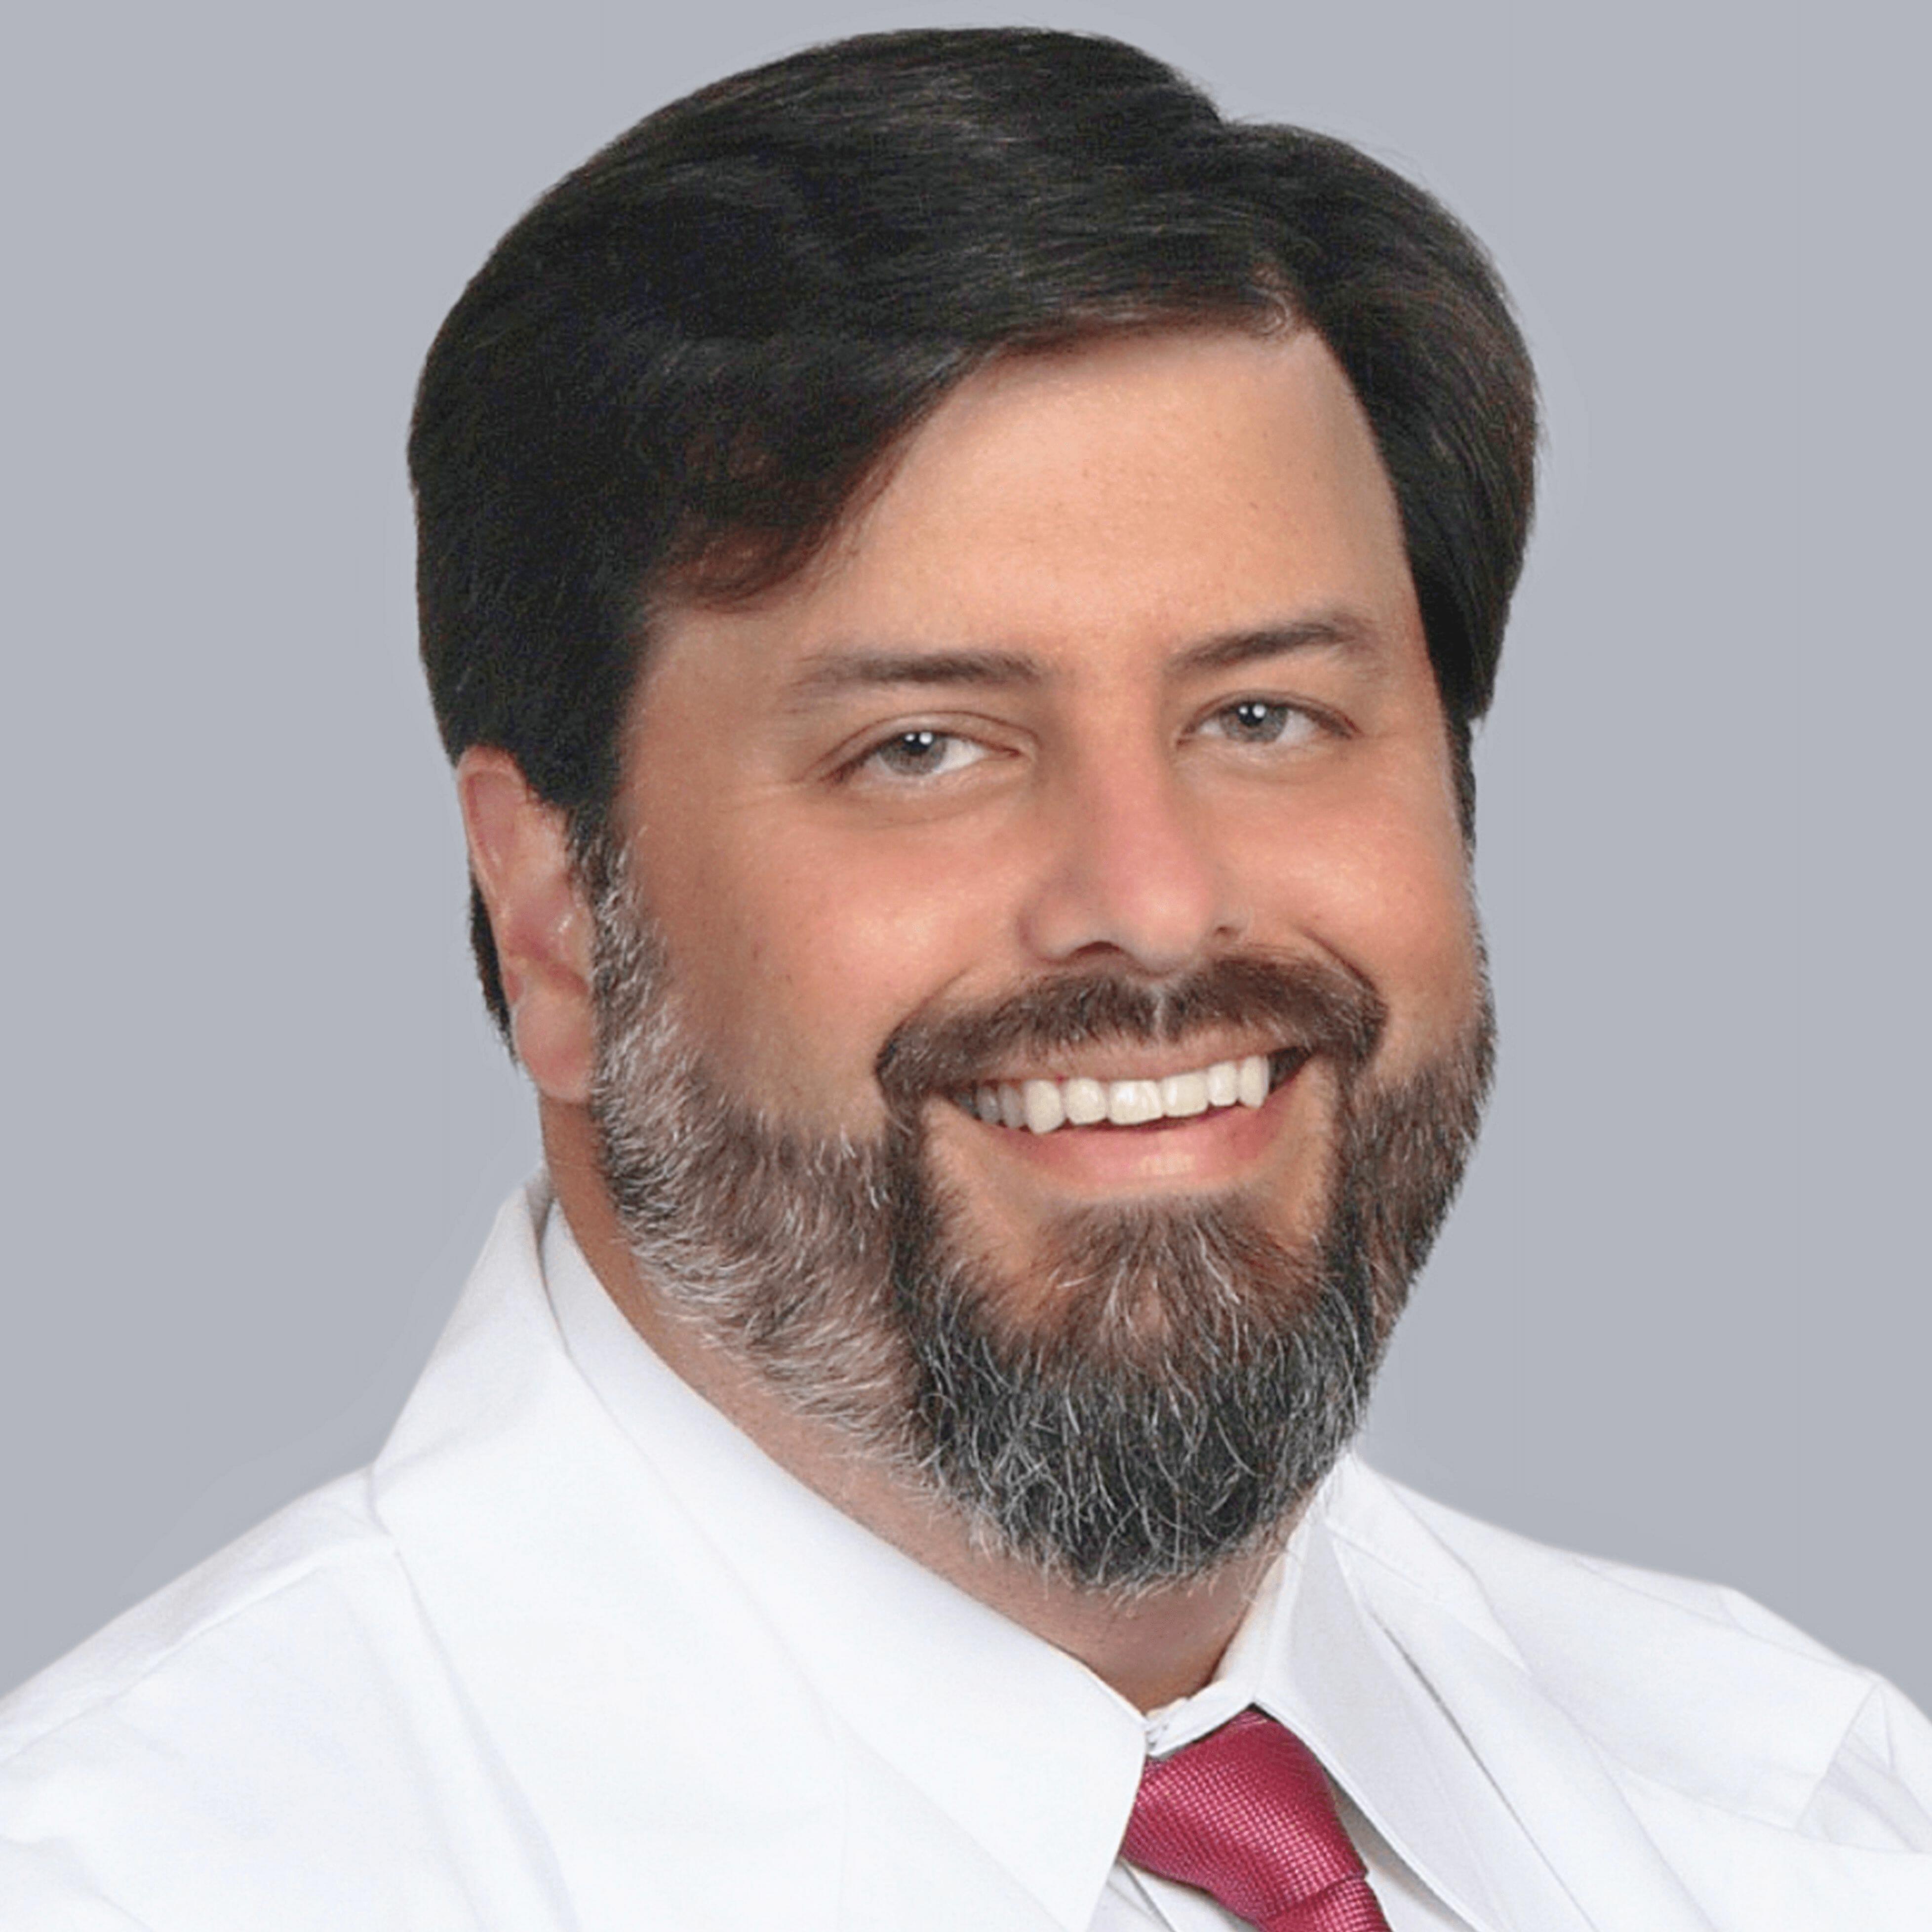 Dr. Jorge Fernandez-Silva, pain management, PPOA Merritt Island, FL